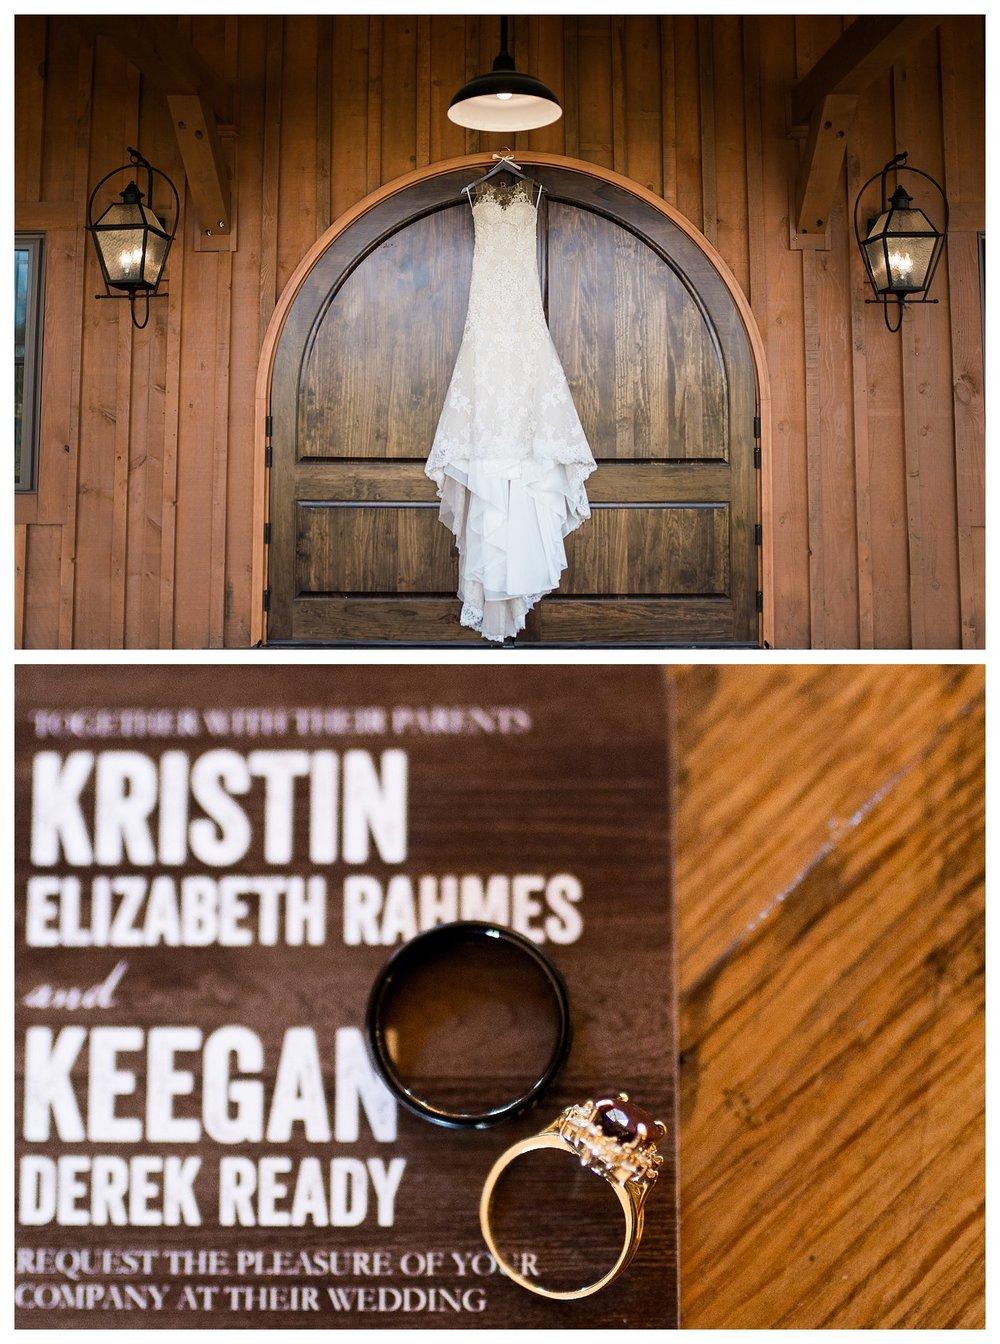 everleigh-photography-cincinnati-wedding-photographer-rolling-meadows-ranch-cincinnati-wedding-photography-wedding-photo-ideas-kristin-and-keegan01